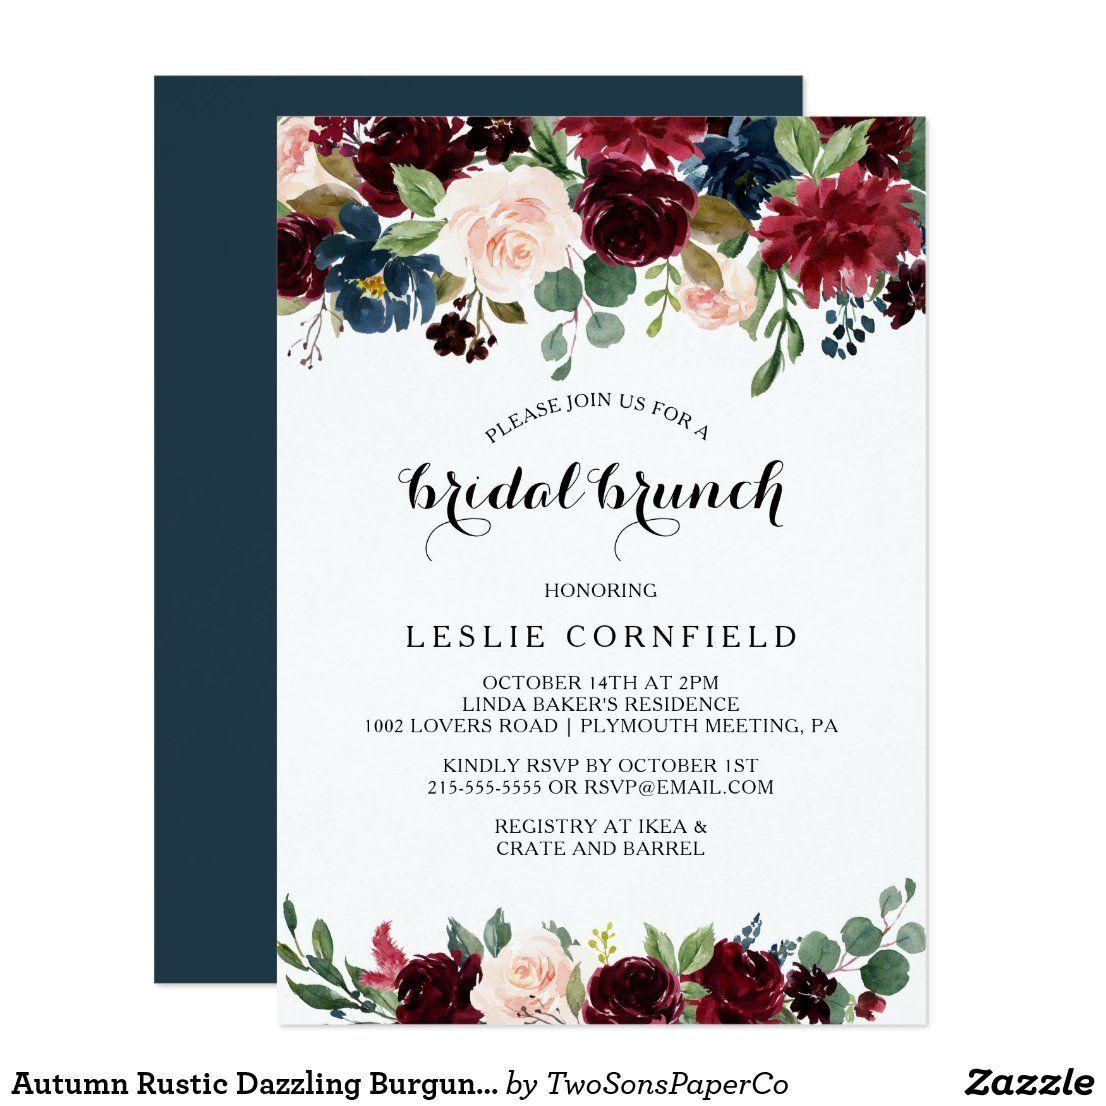 Autumn Rustic Dazzling Burgundy Bridal Brunch Invitation